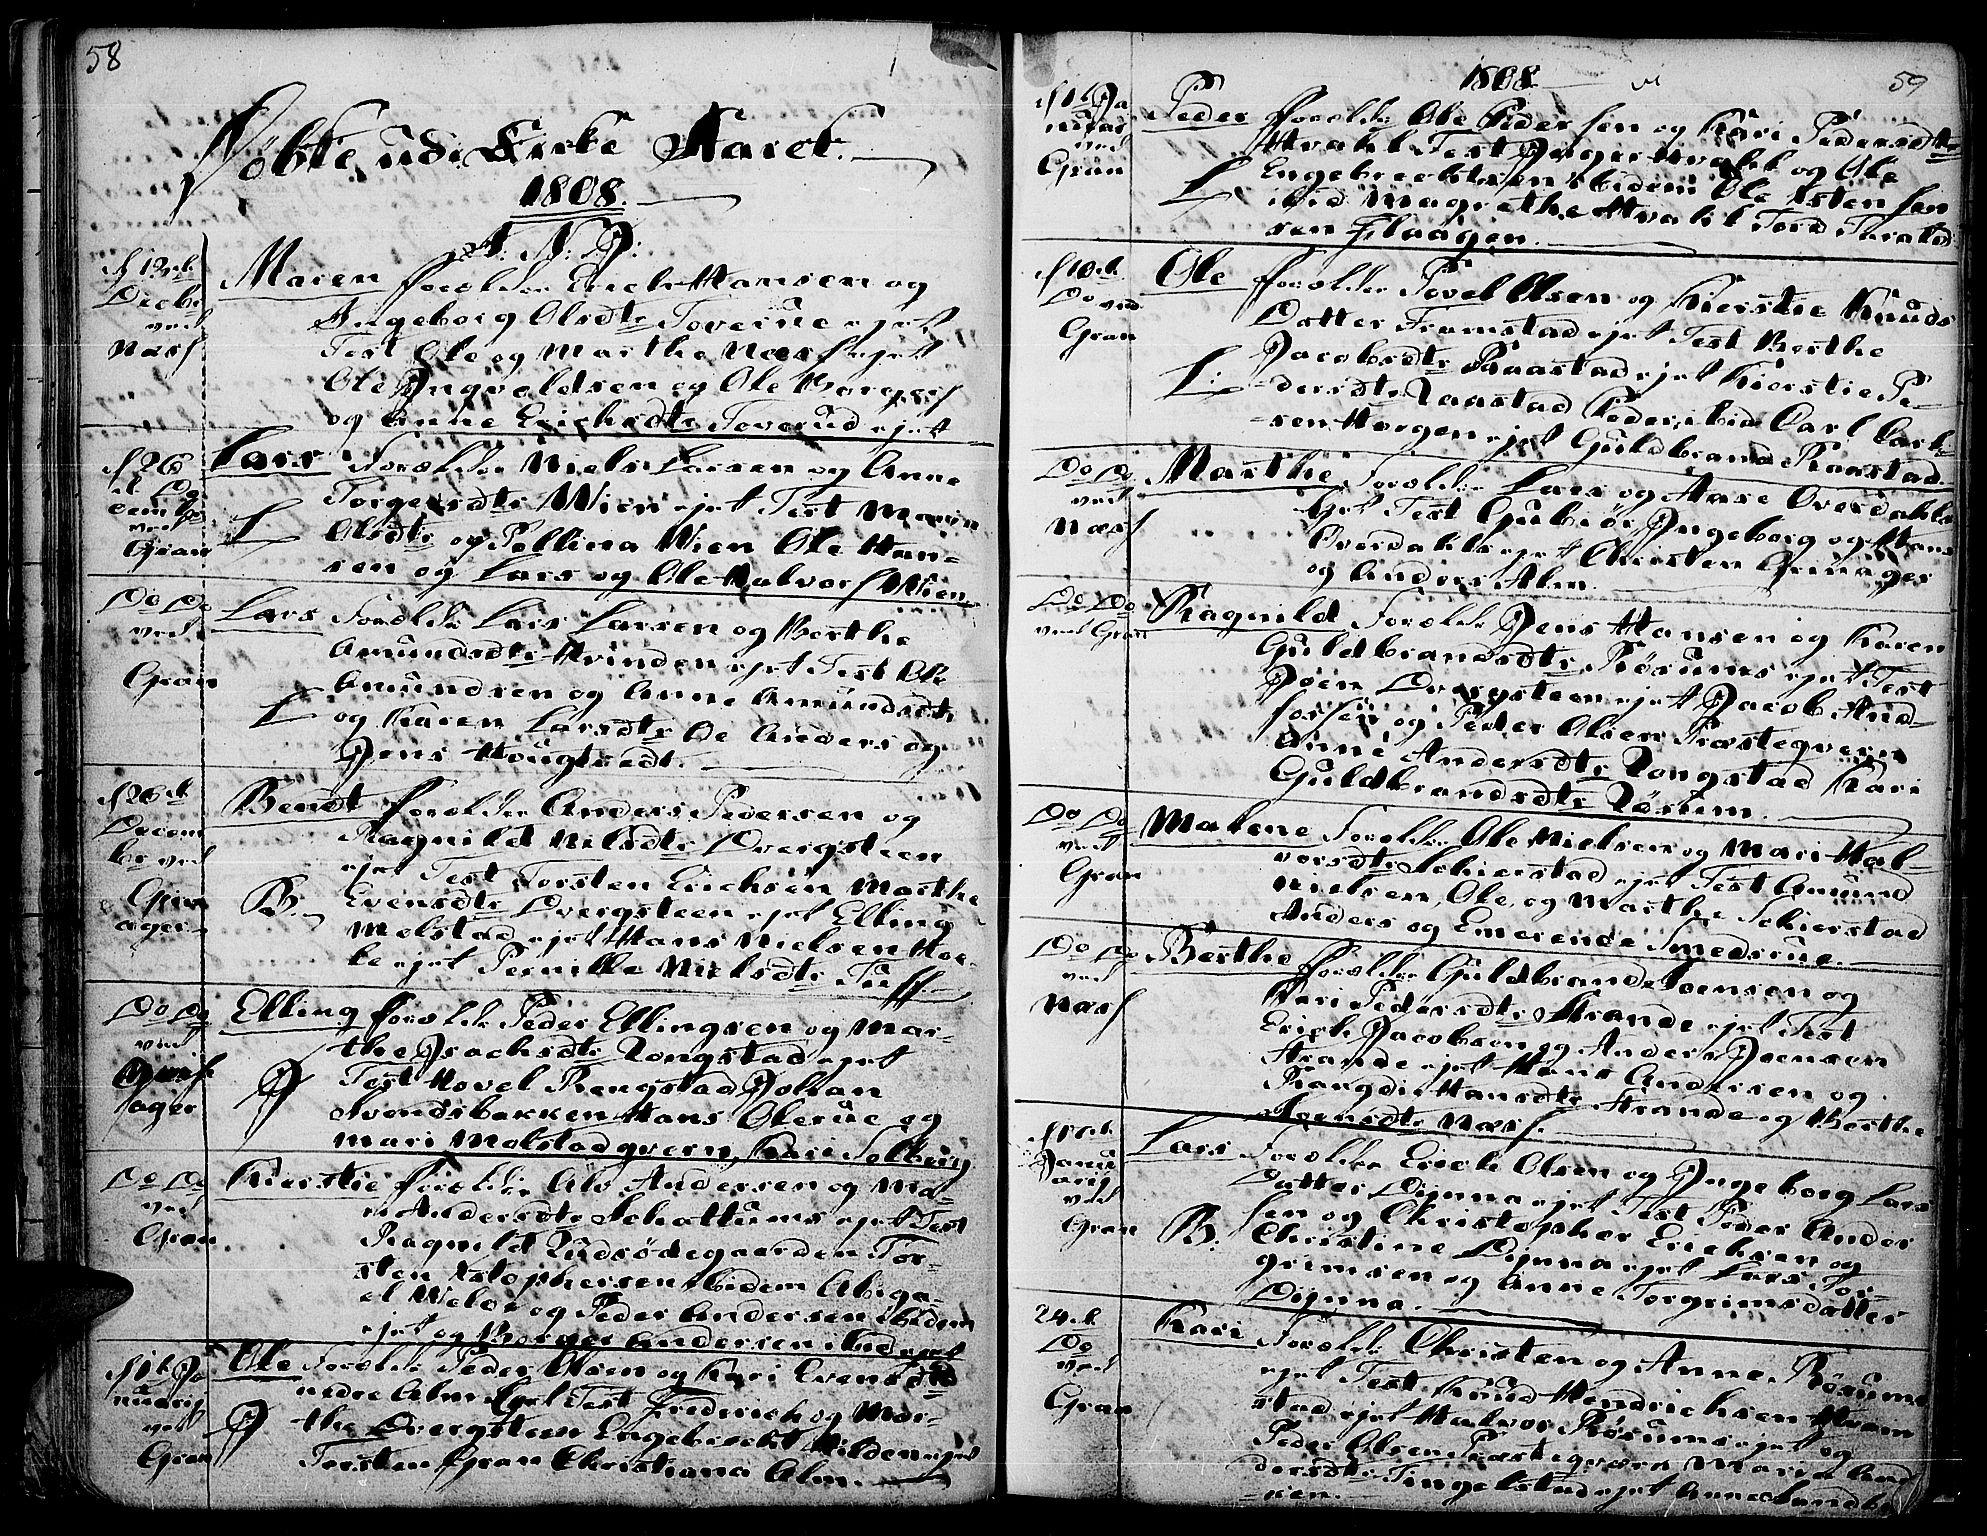 SAH, Gran prestekontor, Ministerialbok nr. 7, 1804-1815, s. 58-59